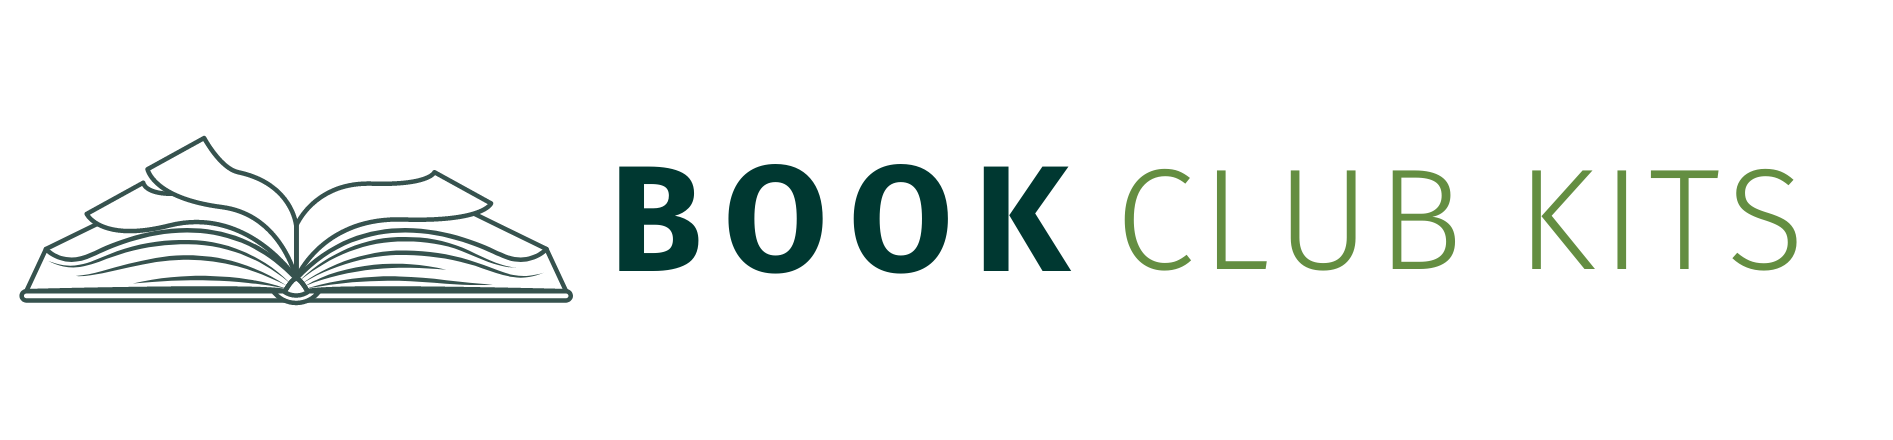 book club kit logo